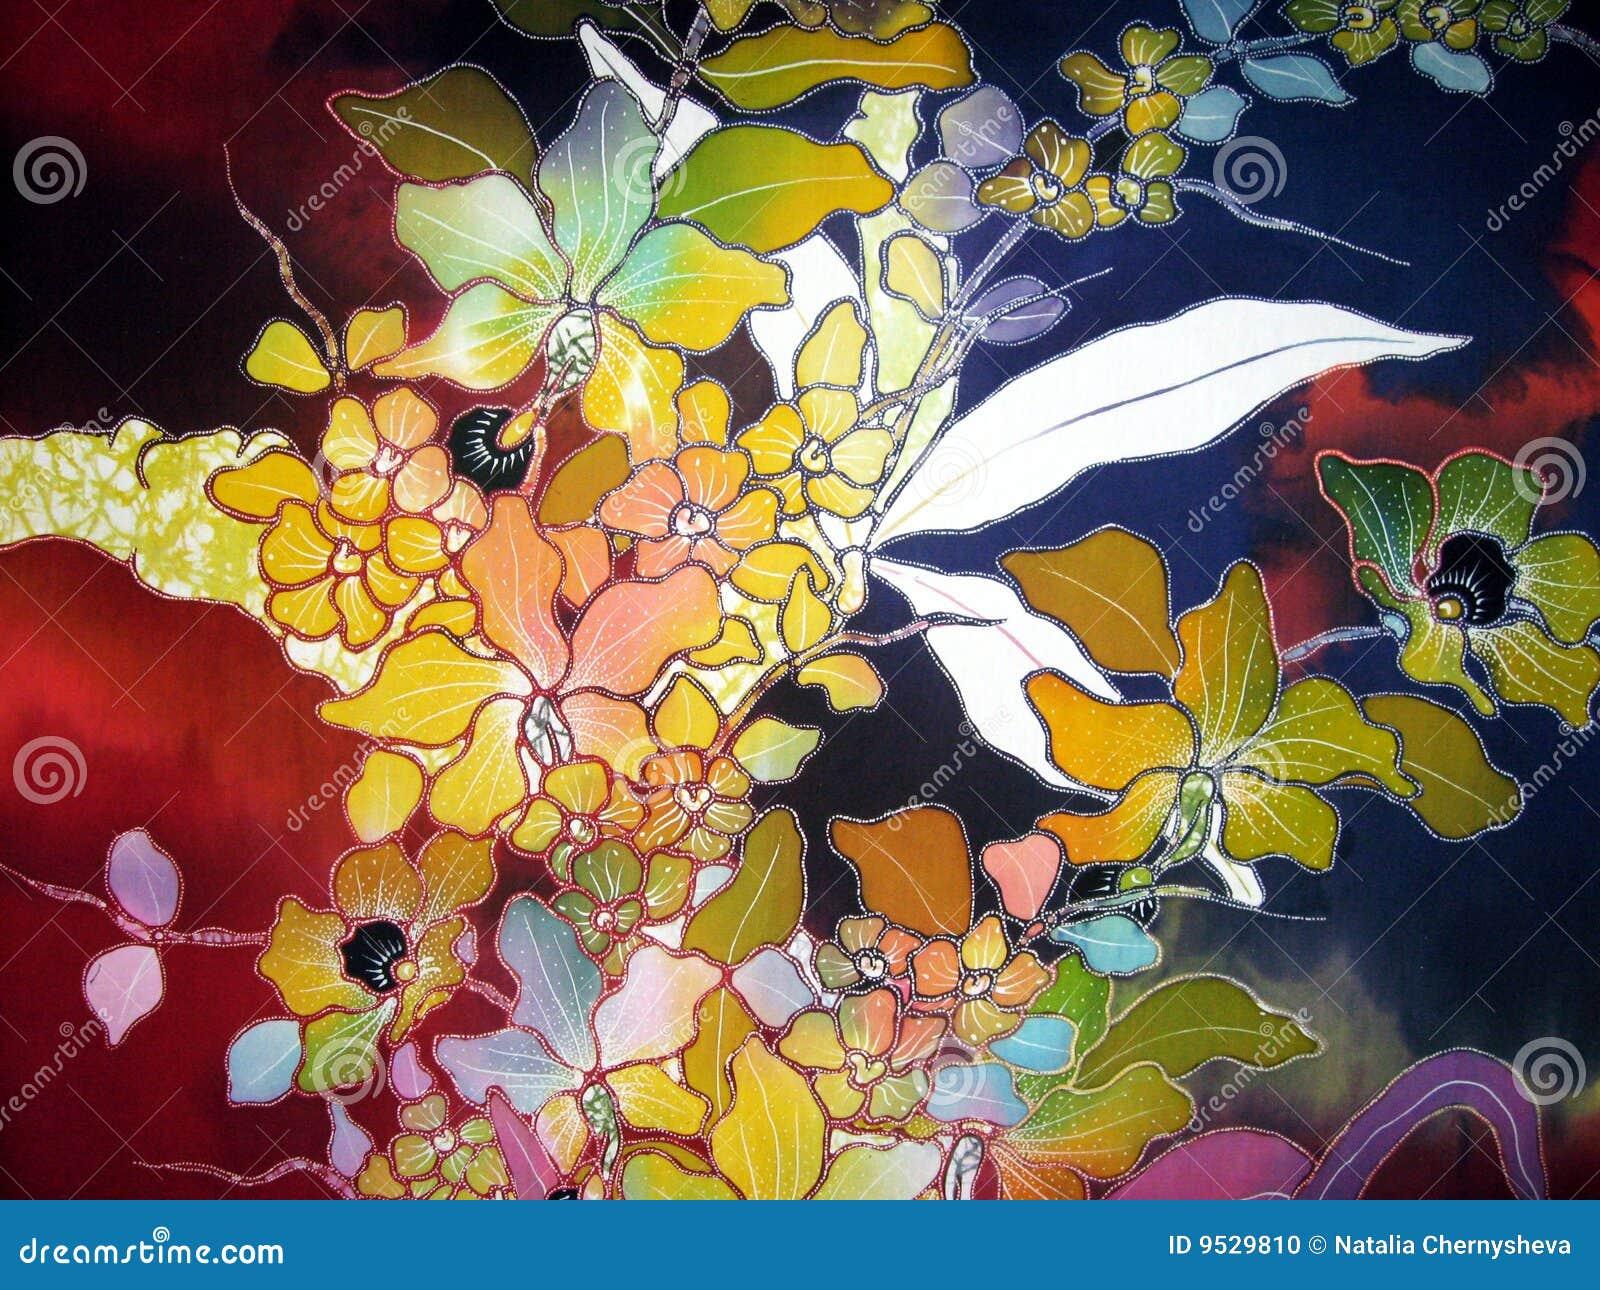 Indonesian Art Stock Photo - Image: 9529810